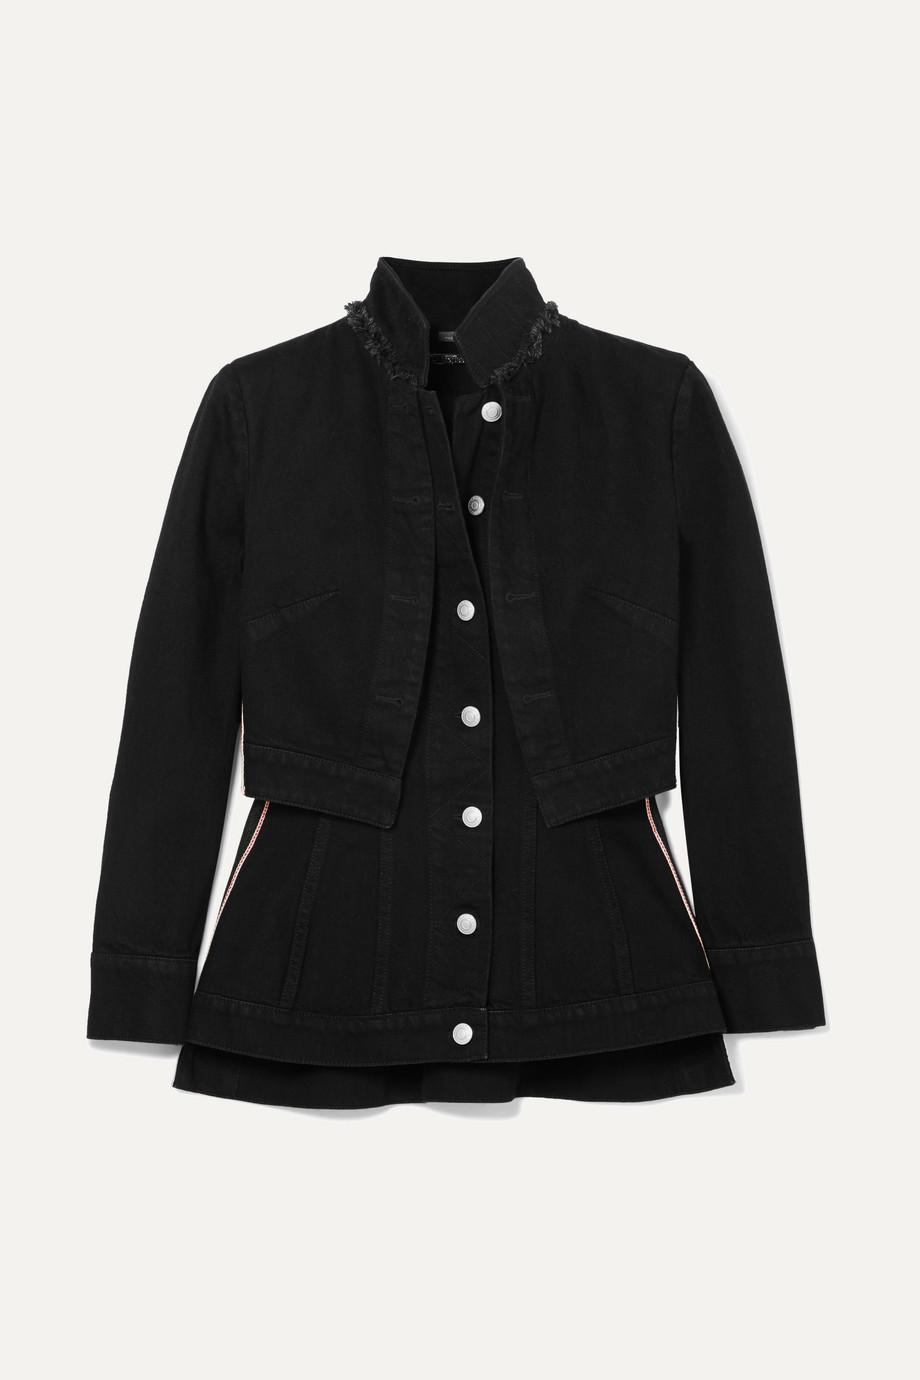 Alexander McQueen Layered grosgrain-trimmed denim jacket